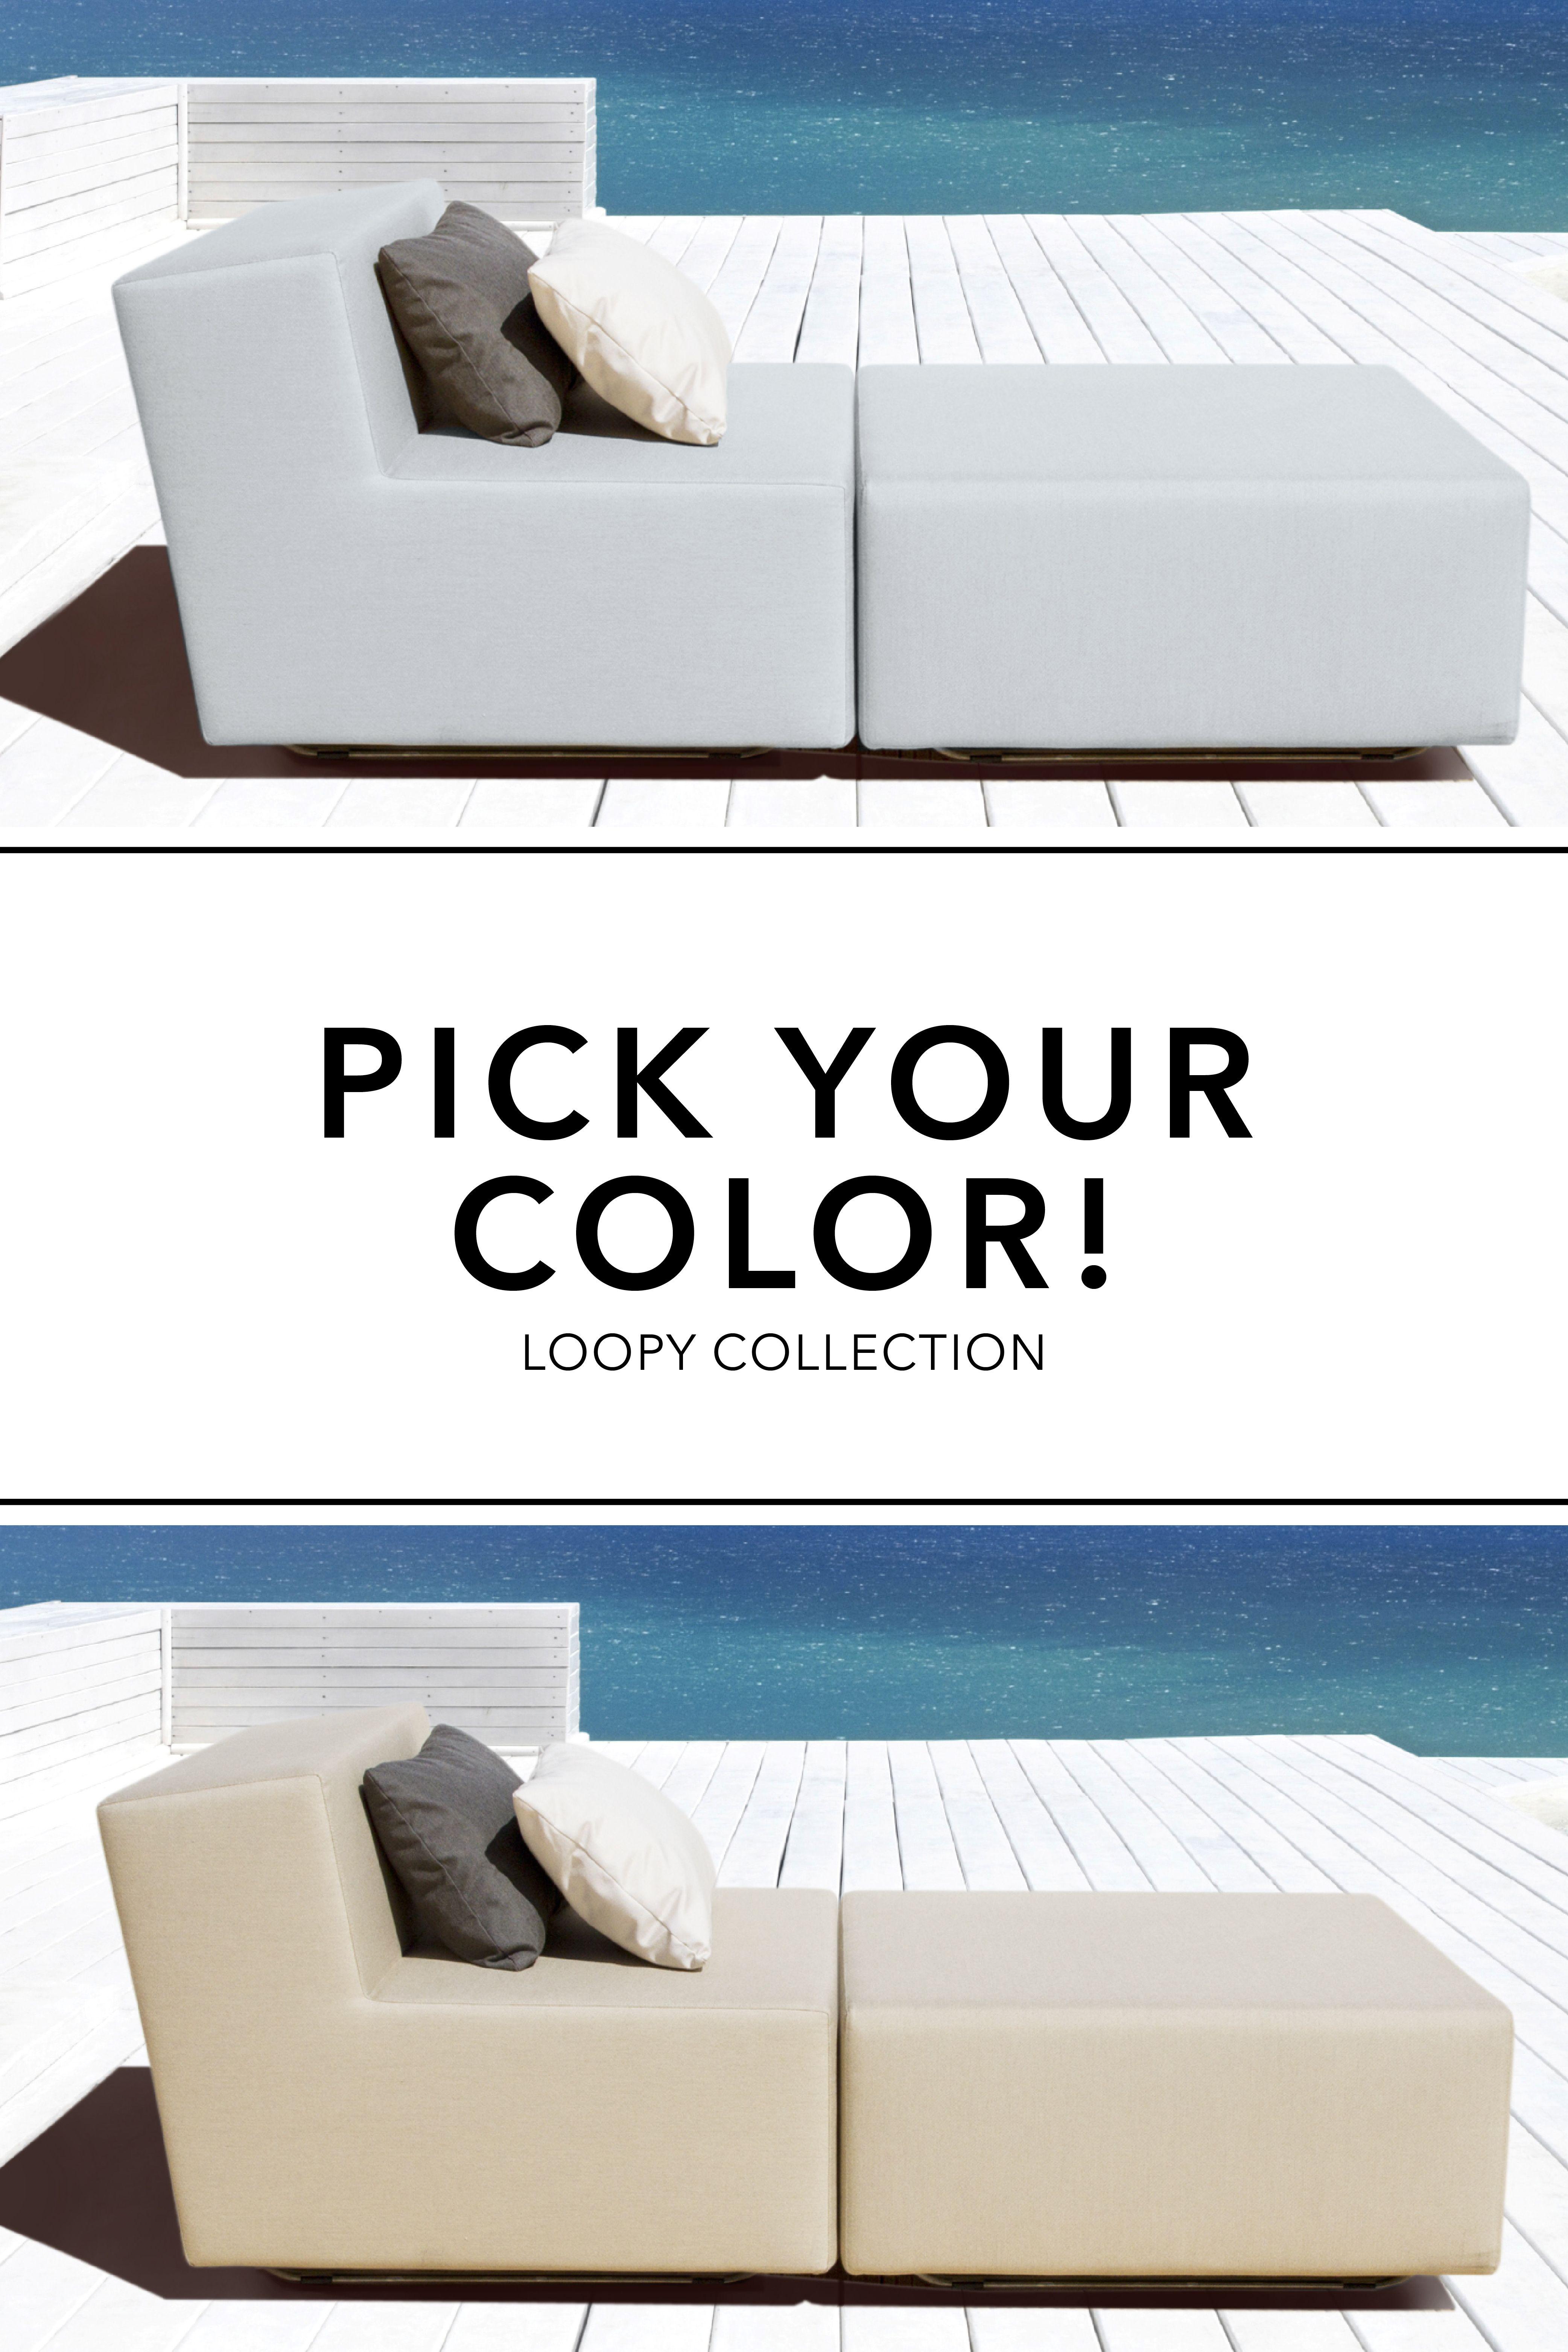 Pick Your Color Modular Outdoor Furniture Collection Loopy Mobelideen Lounge Gartenmobel Gartenmobel Sets